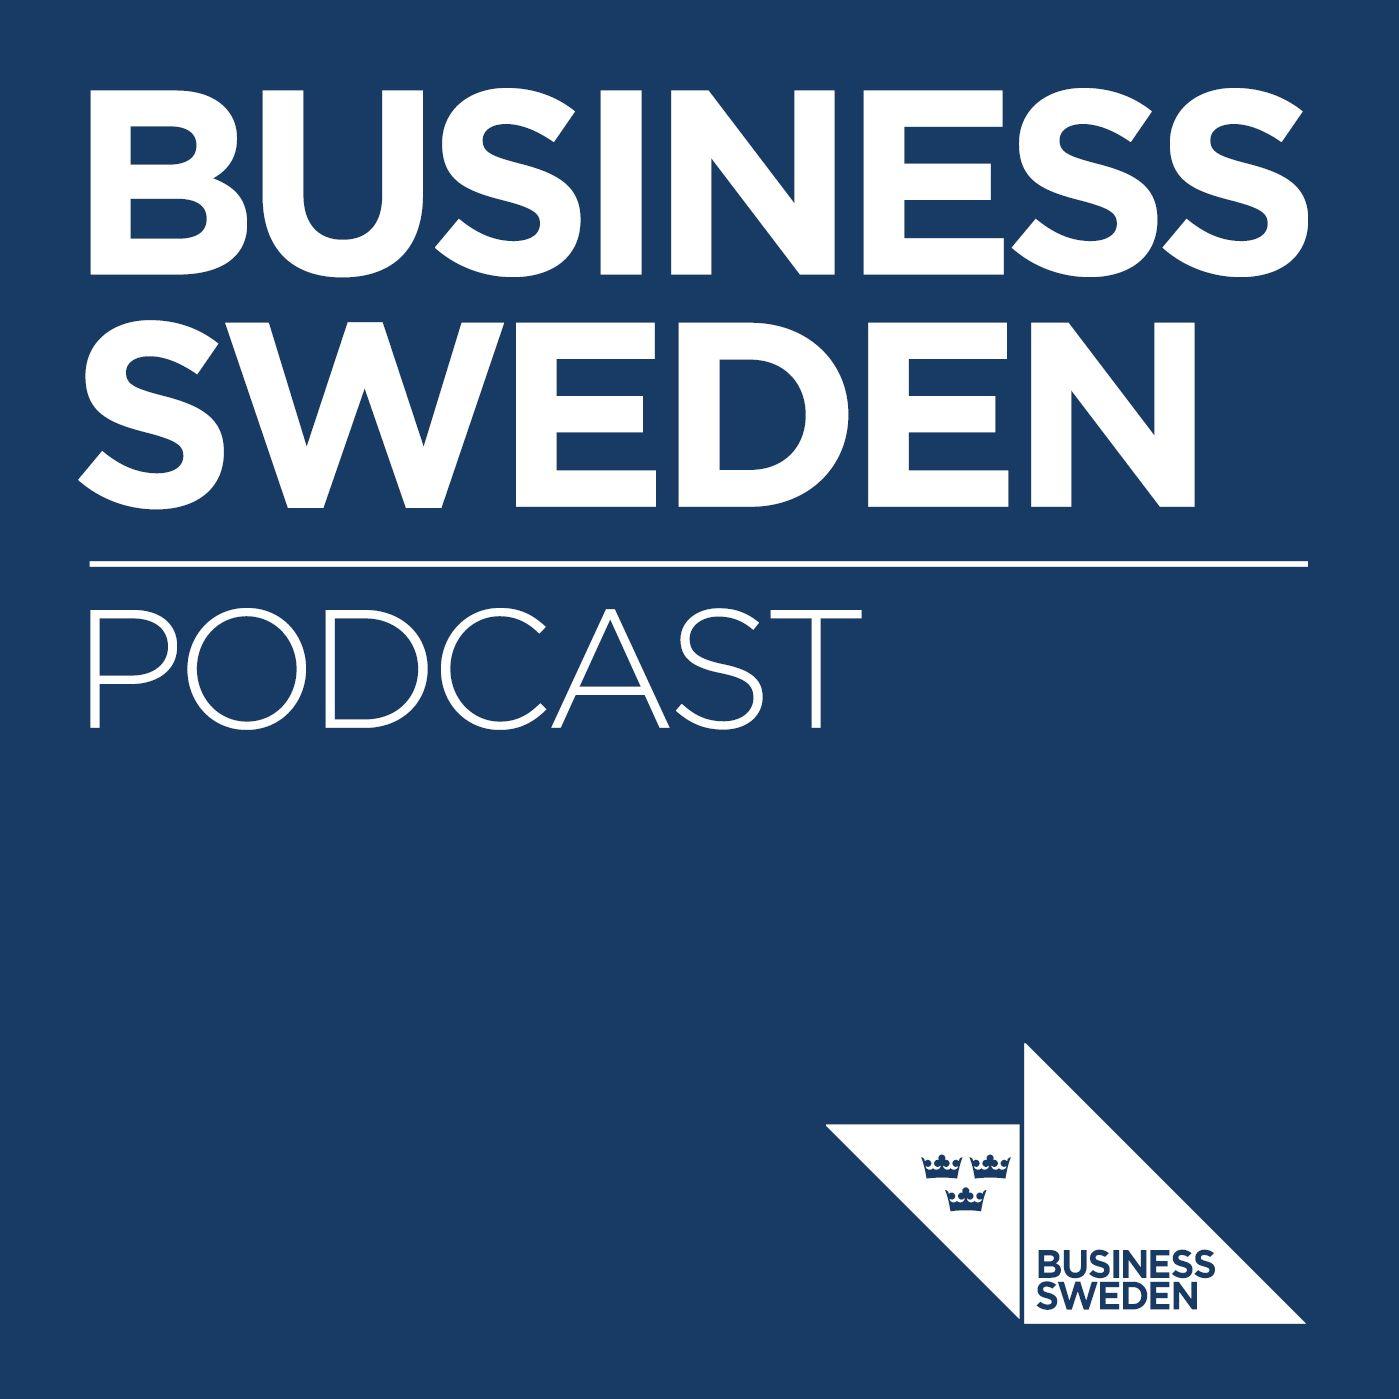 Business Sweden Podcast